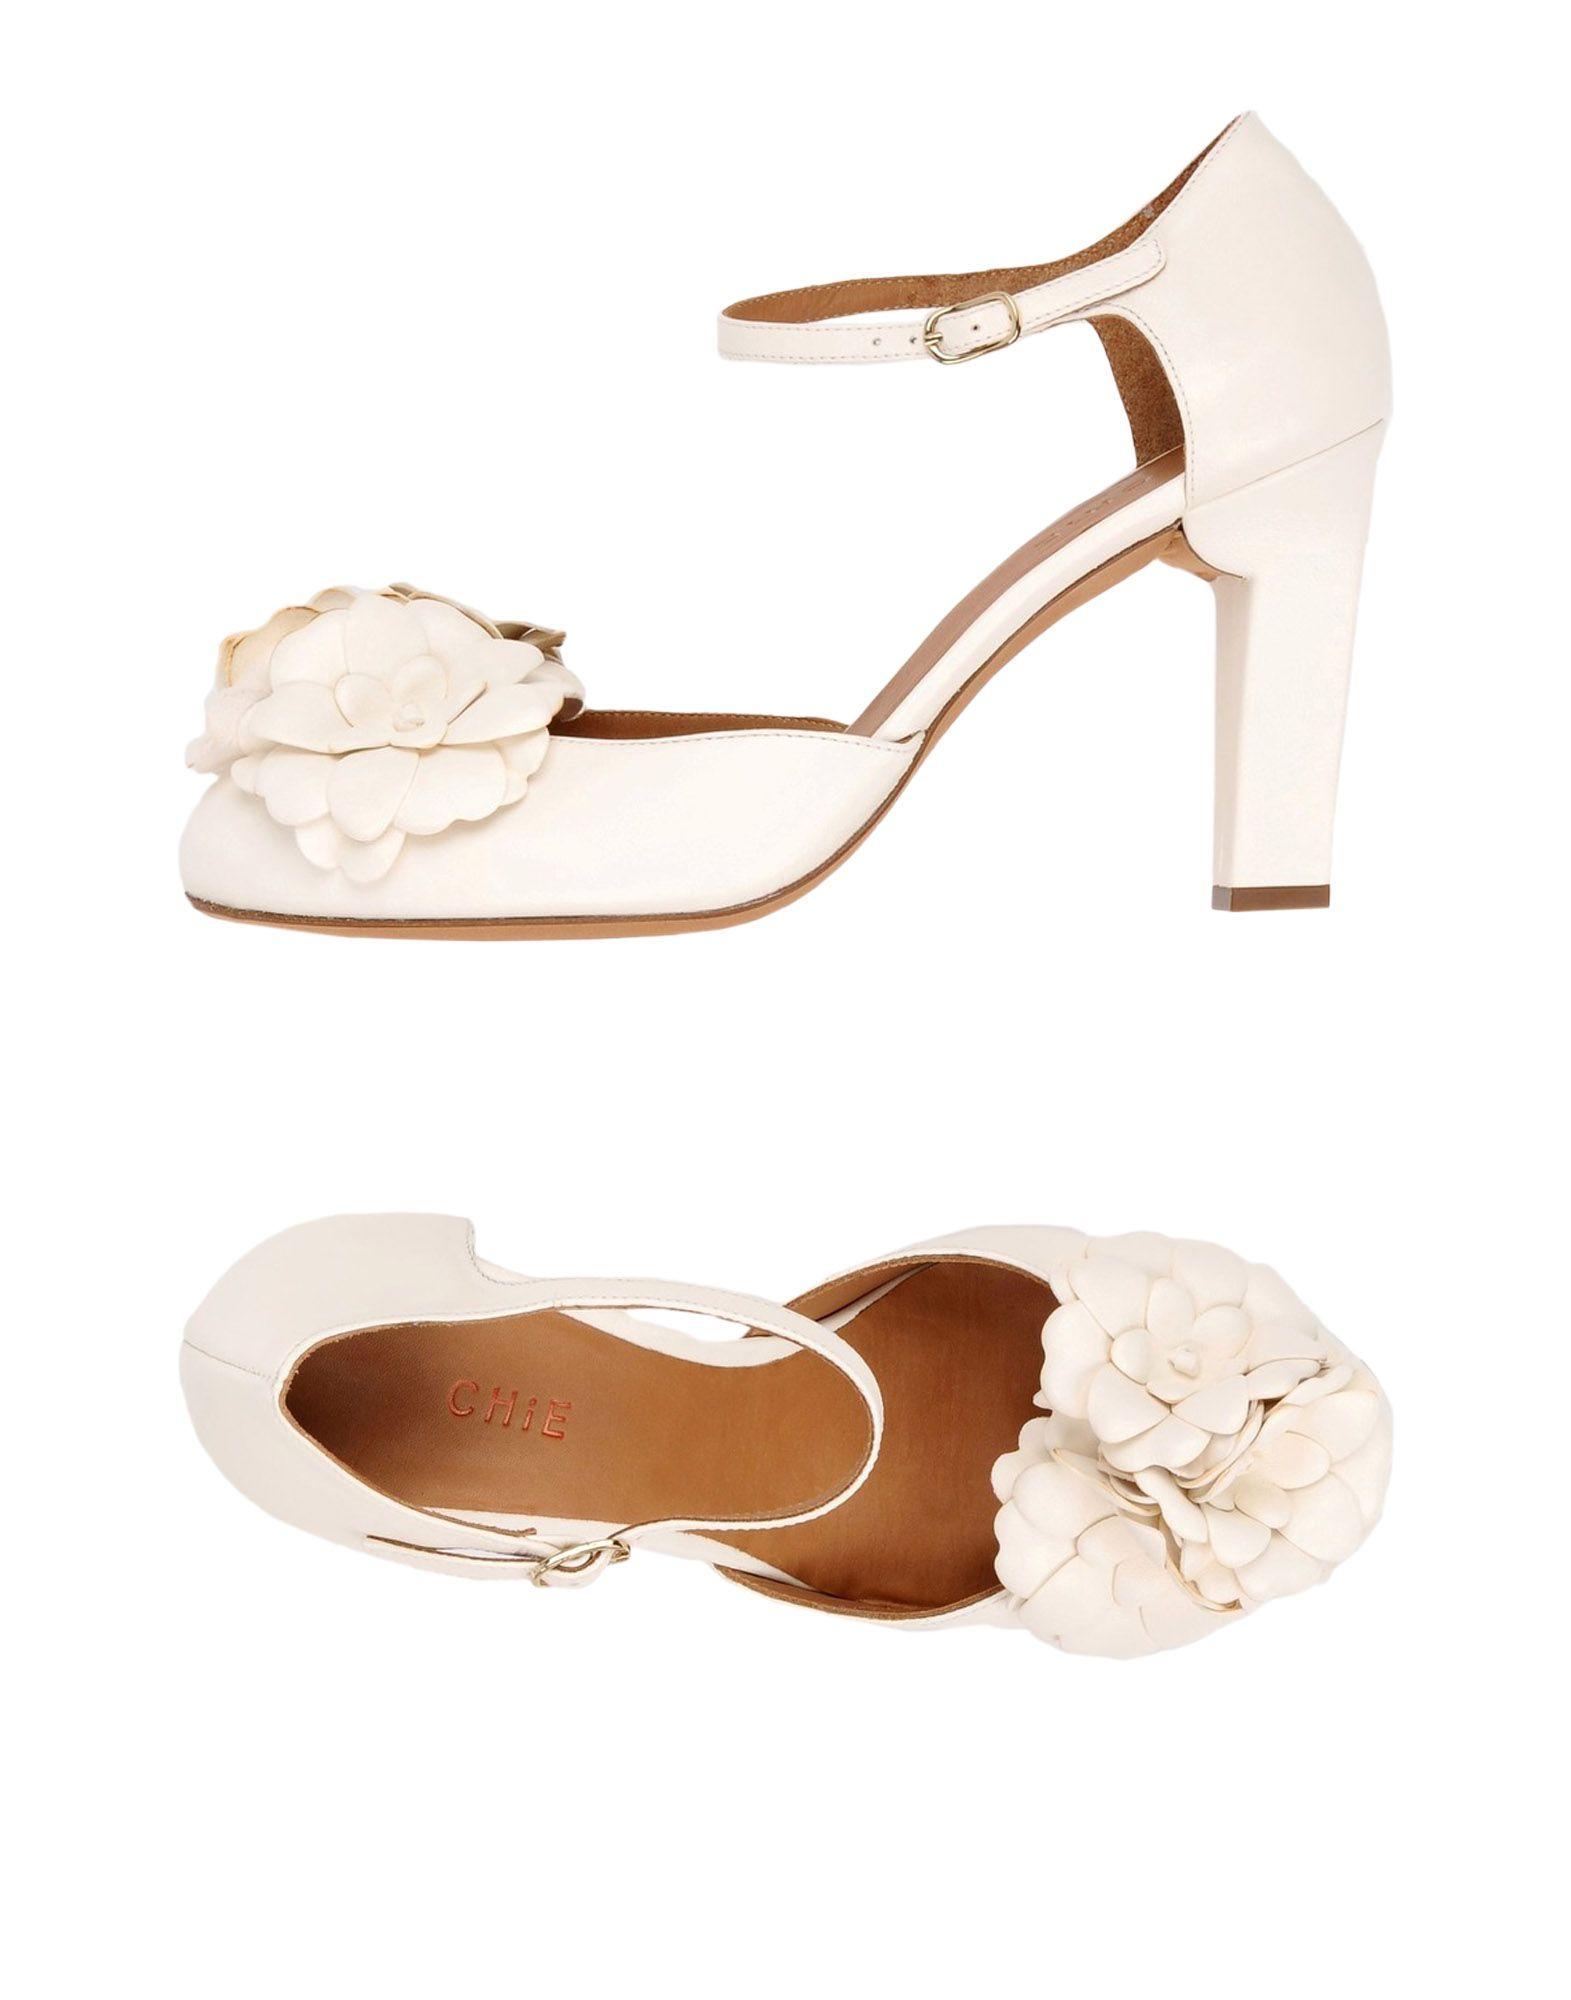 Rabatt Schuhe Chie By Chie 11430092LX Mihara Bri 11430092LX Chie 2db9d1